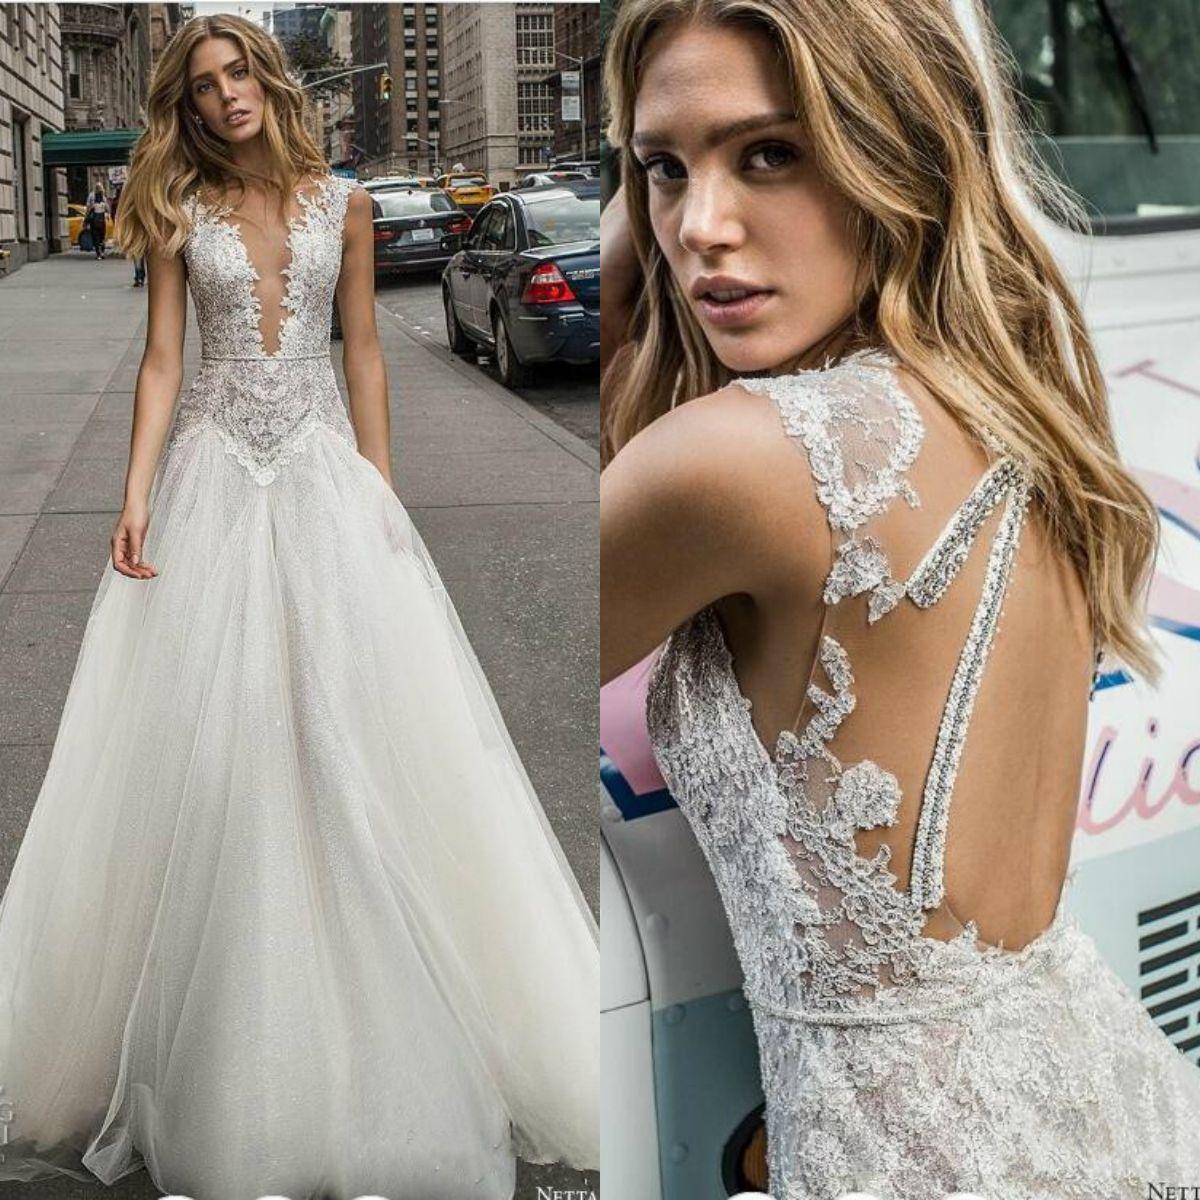 Bohemian 2019 Lace Wedding Dresses Deep V Neck Glitter Beads Appliqued Beach Wedding Dress Bridal Gowns Vestido De Novia